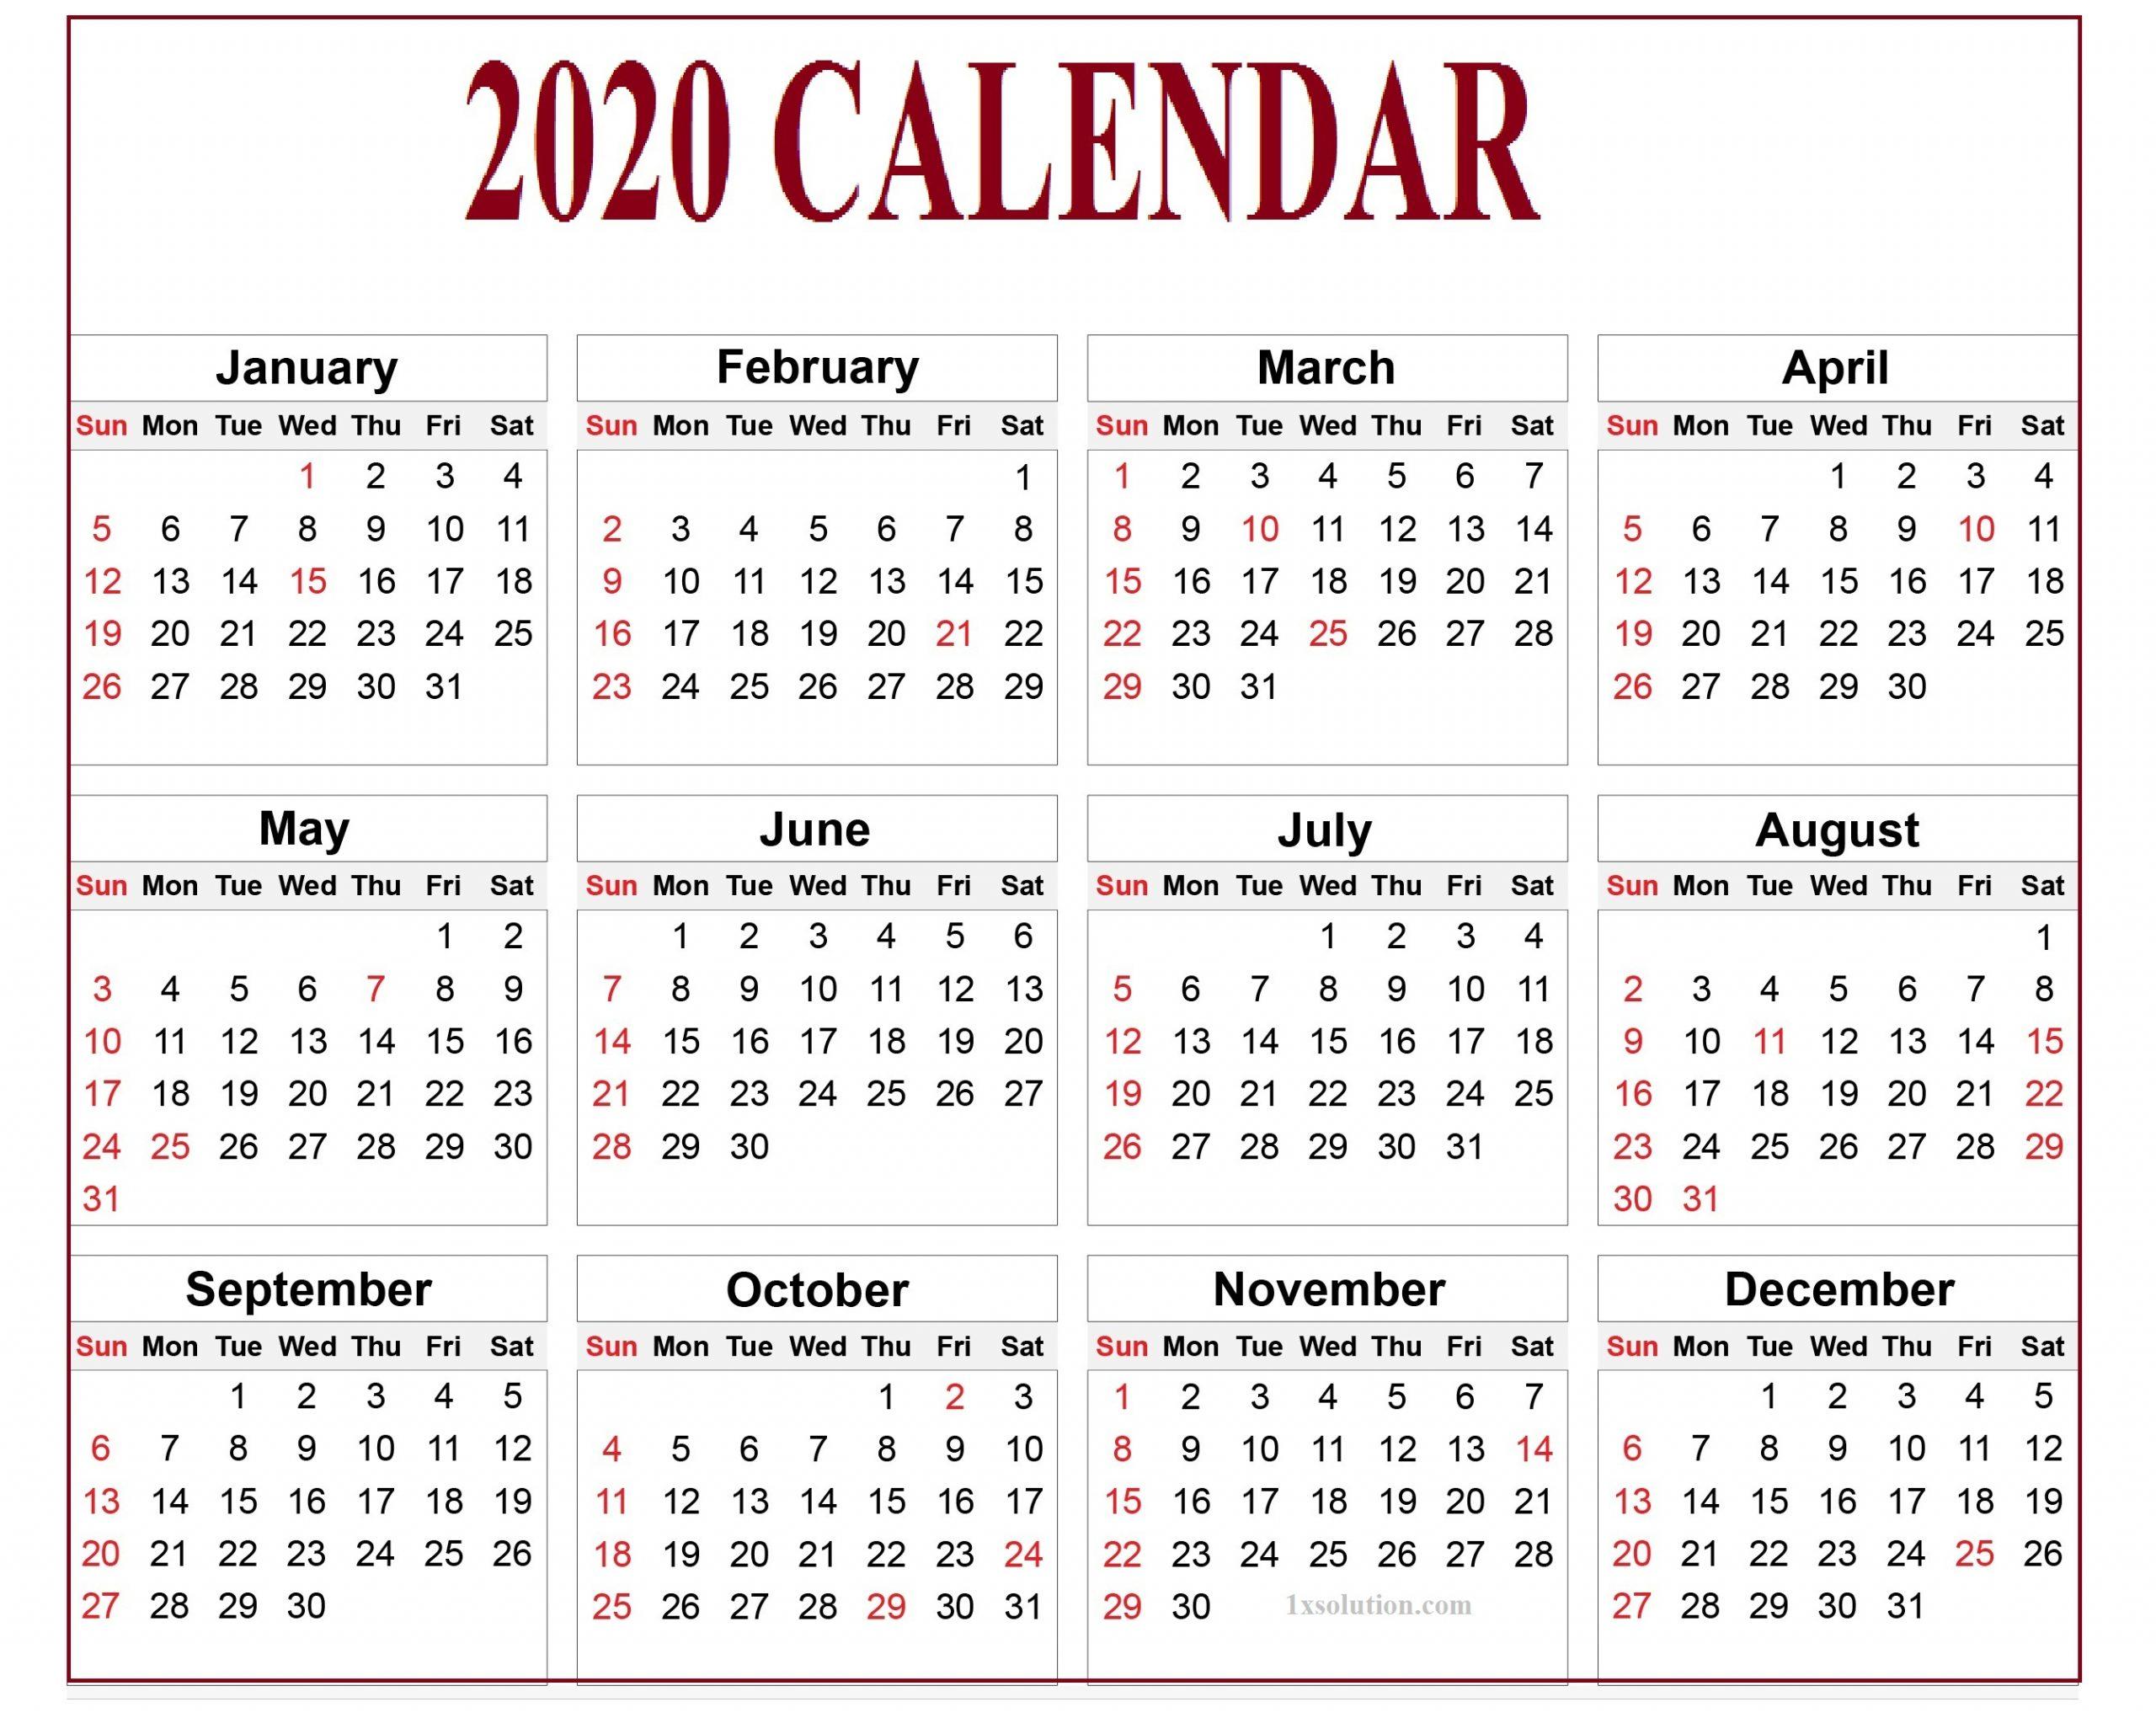 Calendar 2020 Pdf For Mark Your Daily Class |